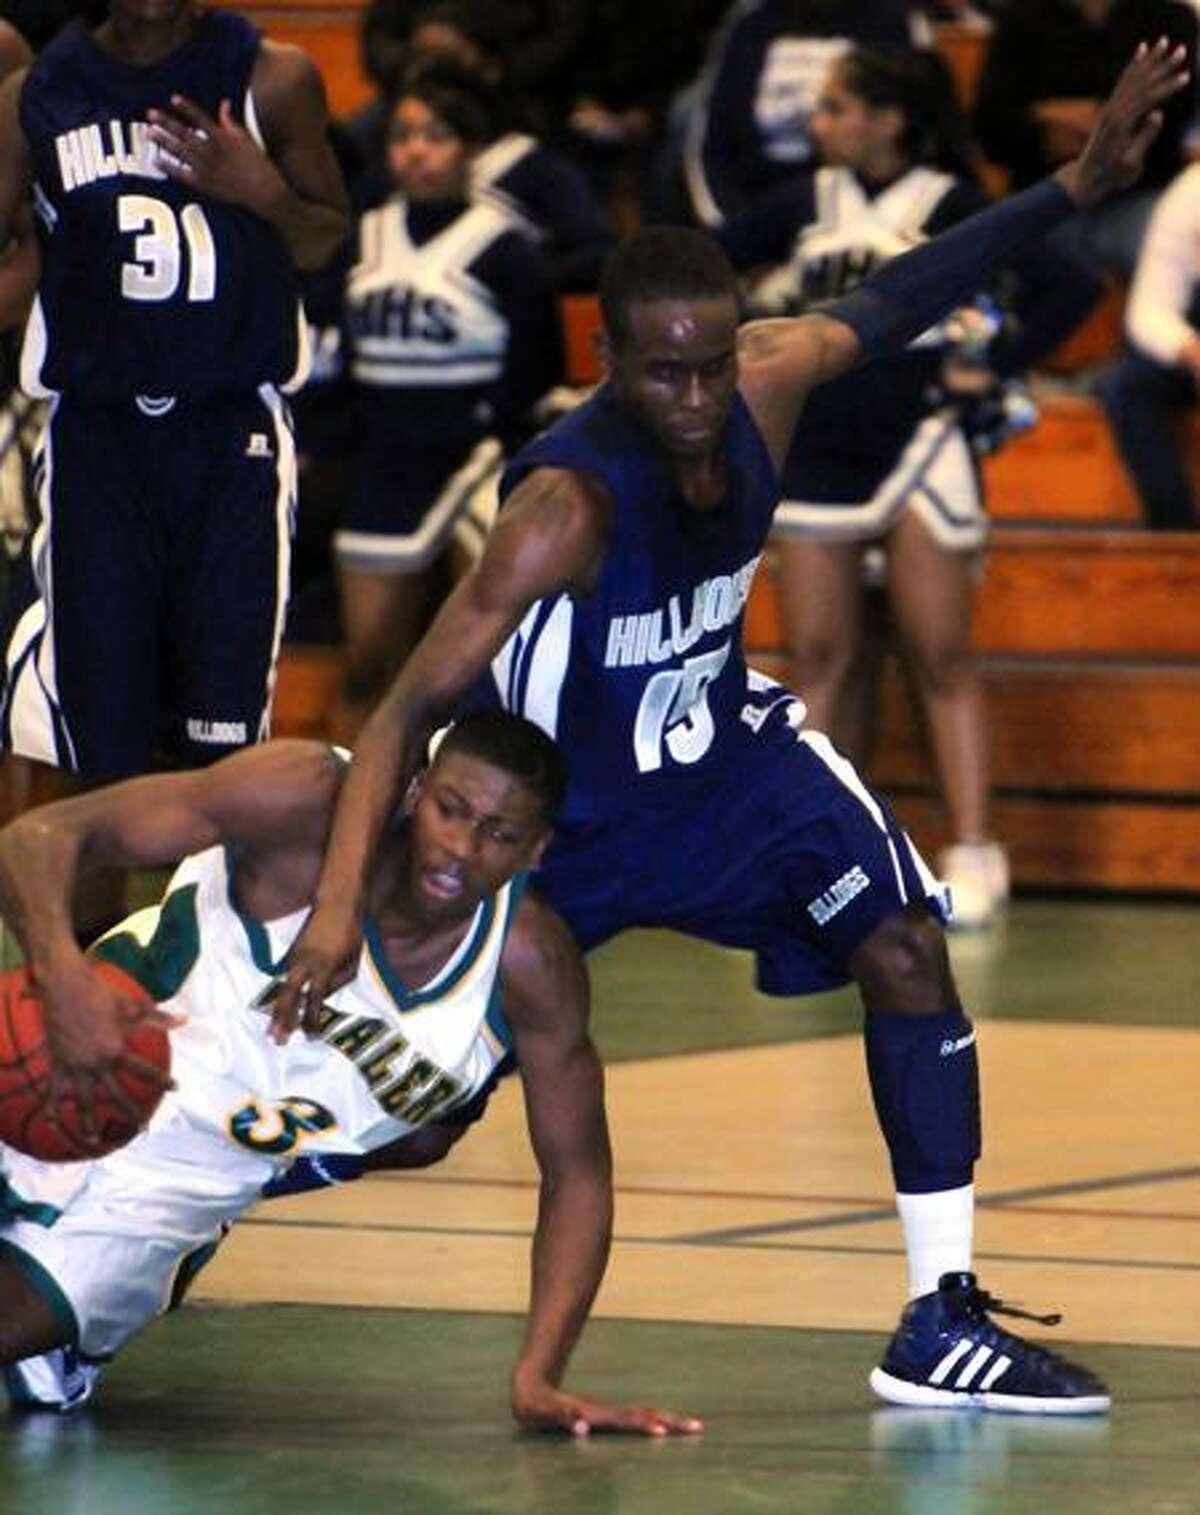 37th annual Doc Hurley Scholarship Basketball Classic, Weaver HS, Hartford. New London's Kris Dunn left and Hillhouse's Richard Bronson right. Photo by Mara Lavitt/New Haven Register12/17/11